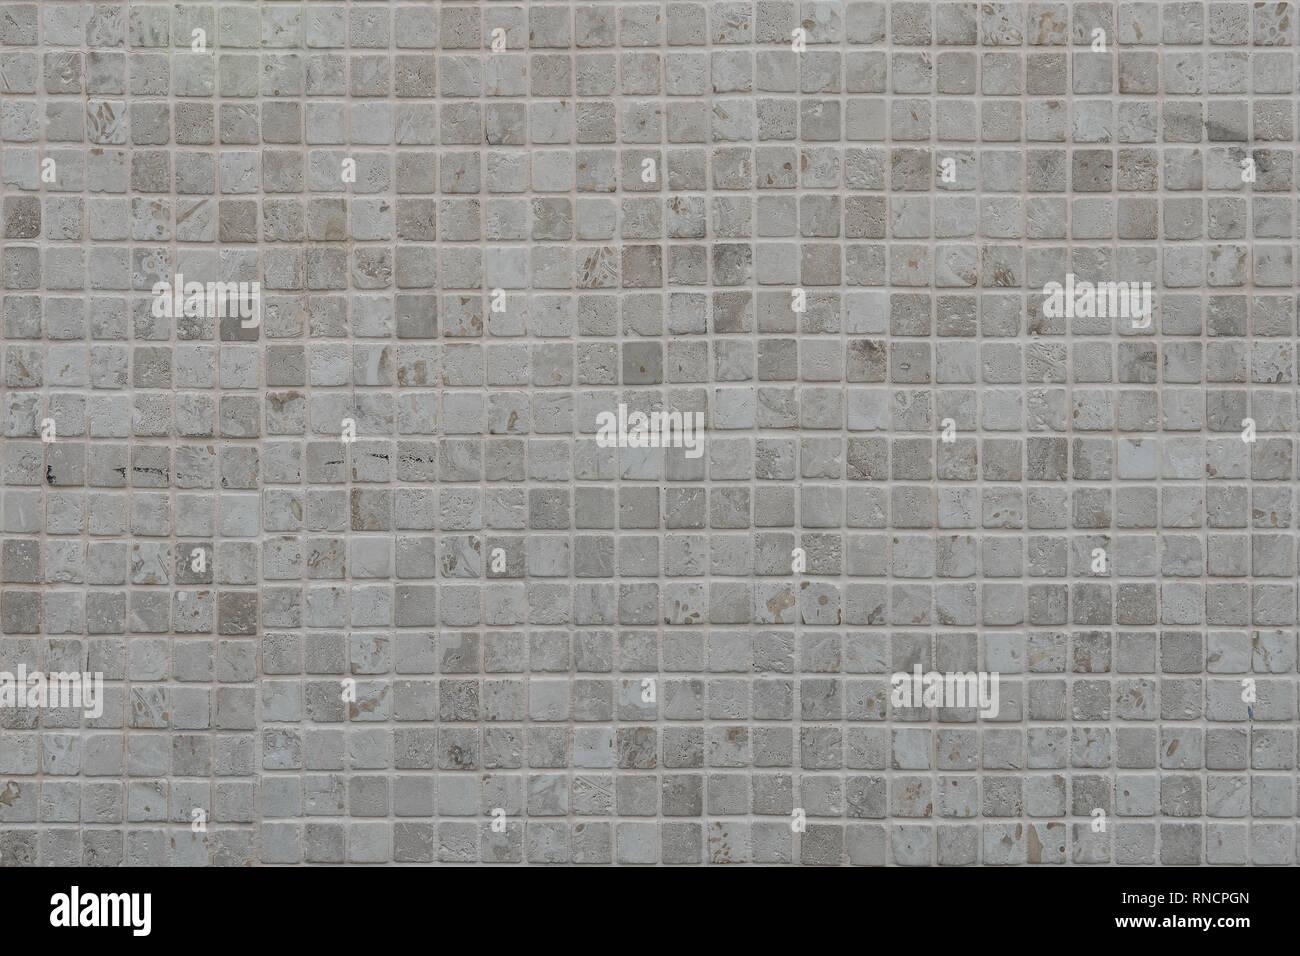 Marble Tile Texture Stone Wall Surface Grunge Rock Bricks